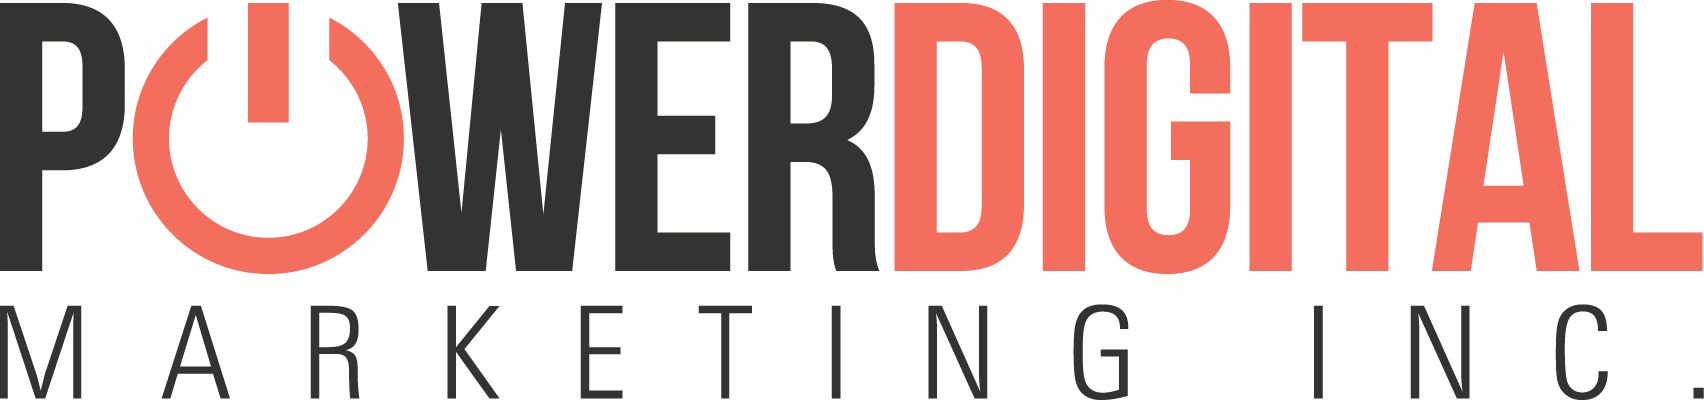 PDM-Full-Logo-Hi-Res.png